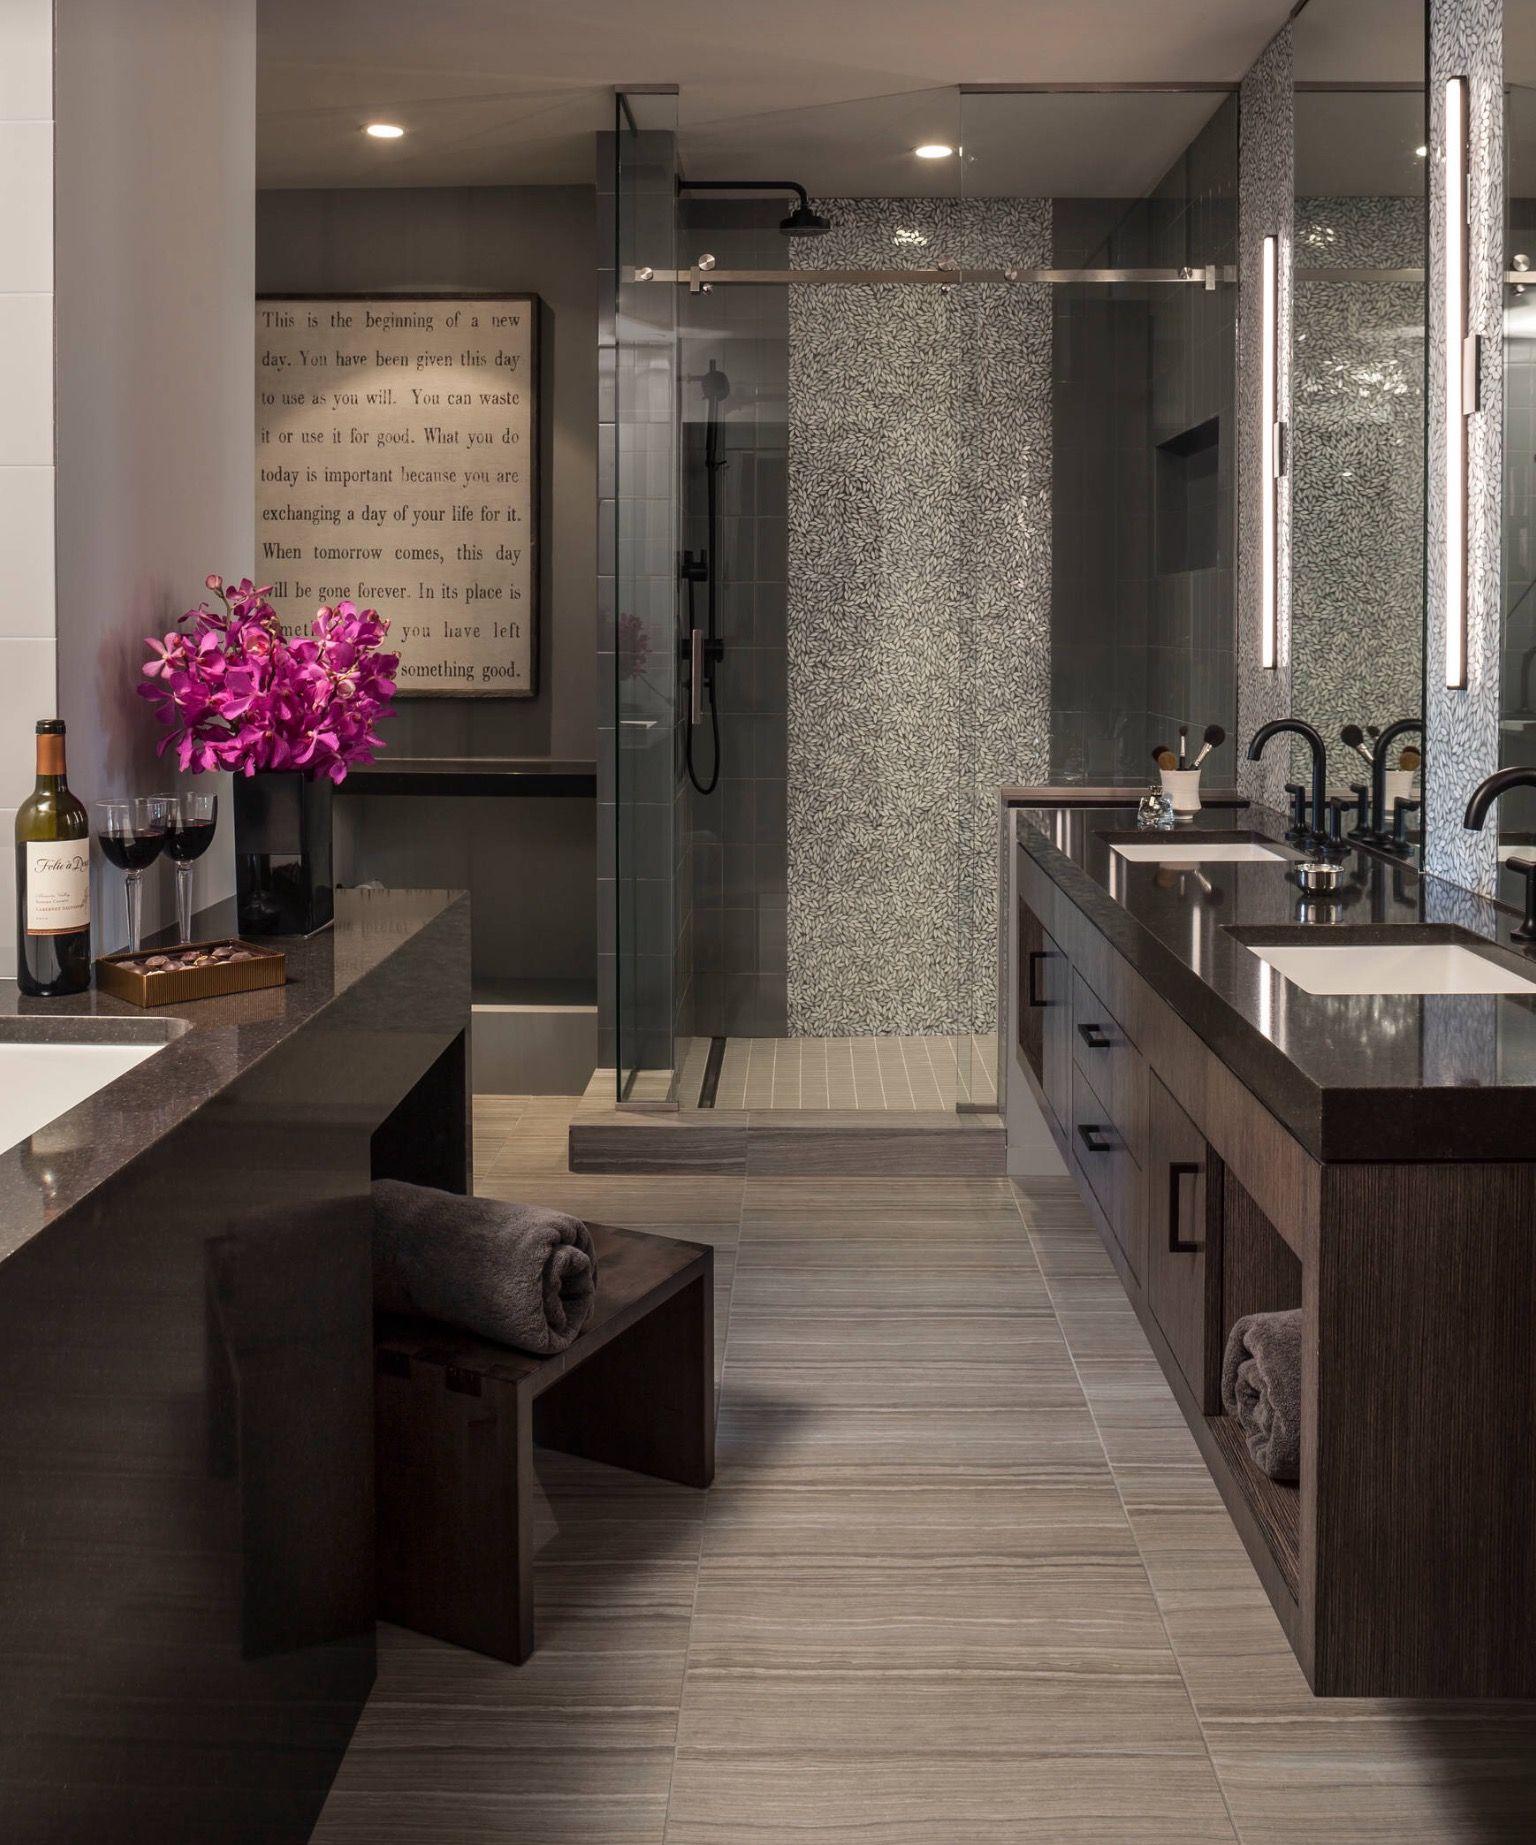 Pin By Bethany Wesco On Future Home Ideas Master Suite Luxury Bedroom Master Luxury Master Bathrooms Bathroom Decor Luxury